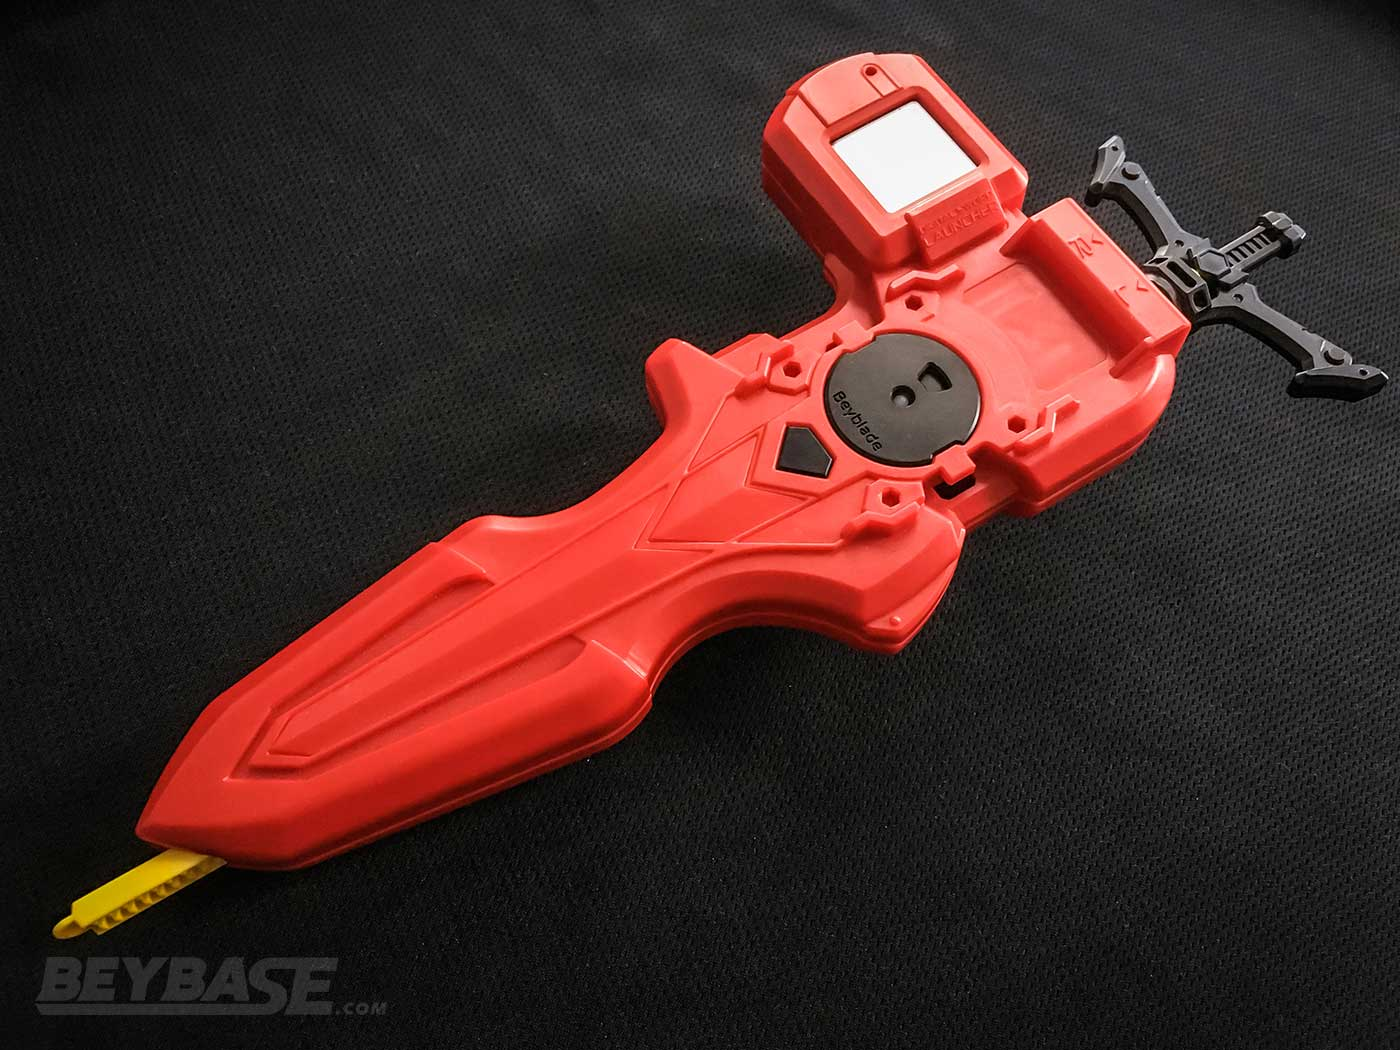 beyblade burst takara tomy digital sword launcher